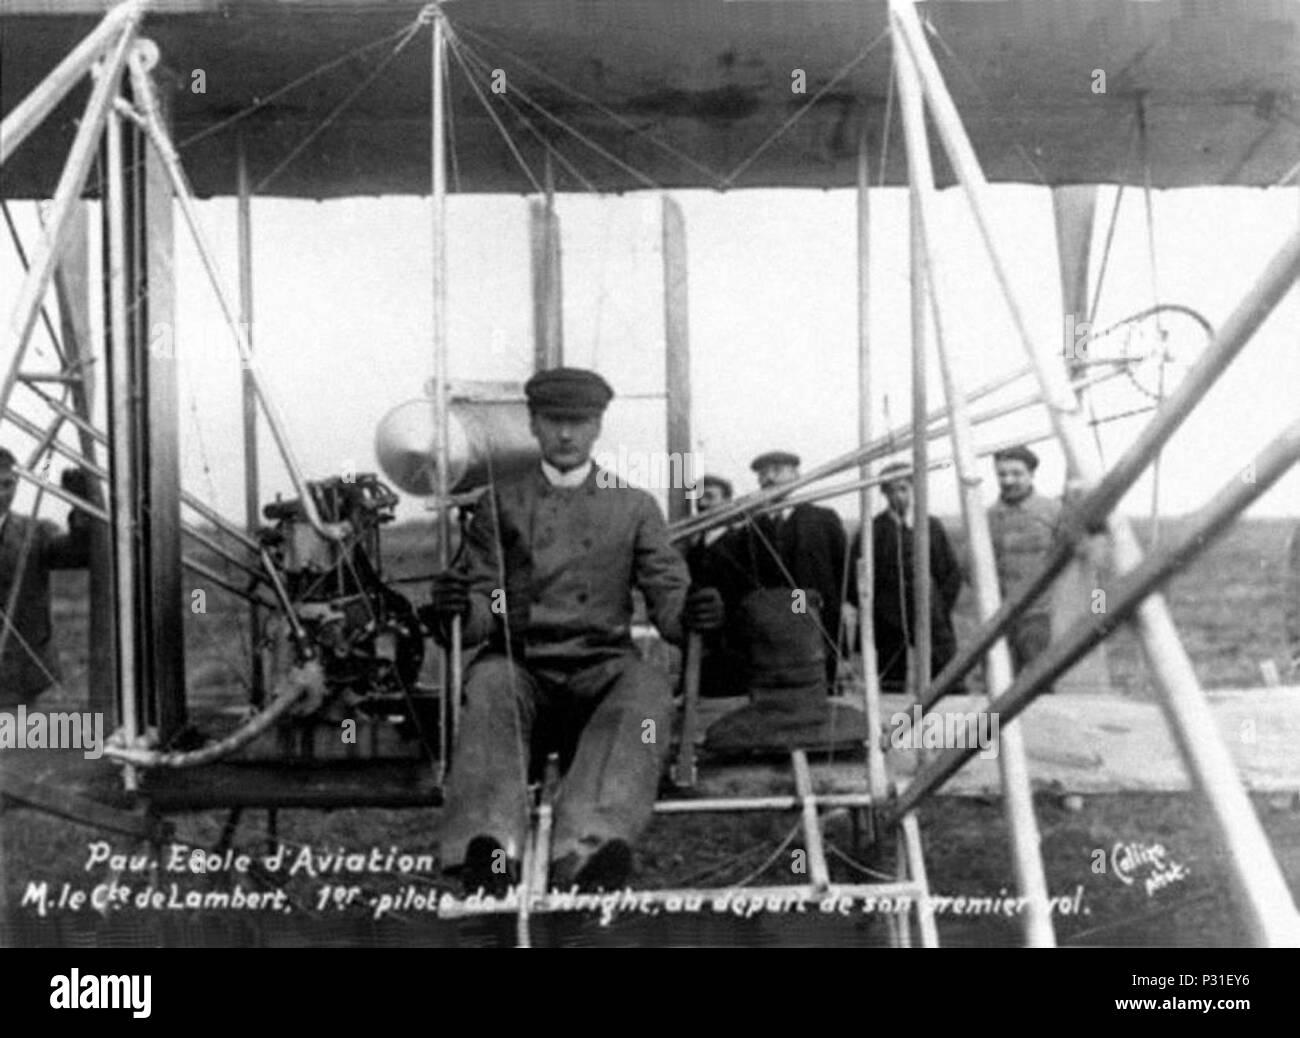 -Carlos Alexandre, conde de Lambert 1C2BA piloto hacer biplano Wrigth no seu primeiro voo - Pau, 1908 Foto de stock